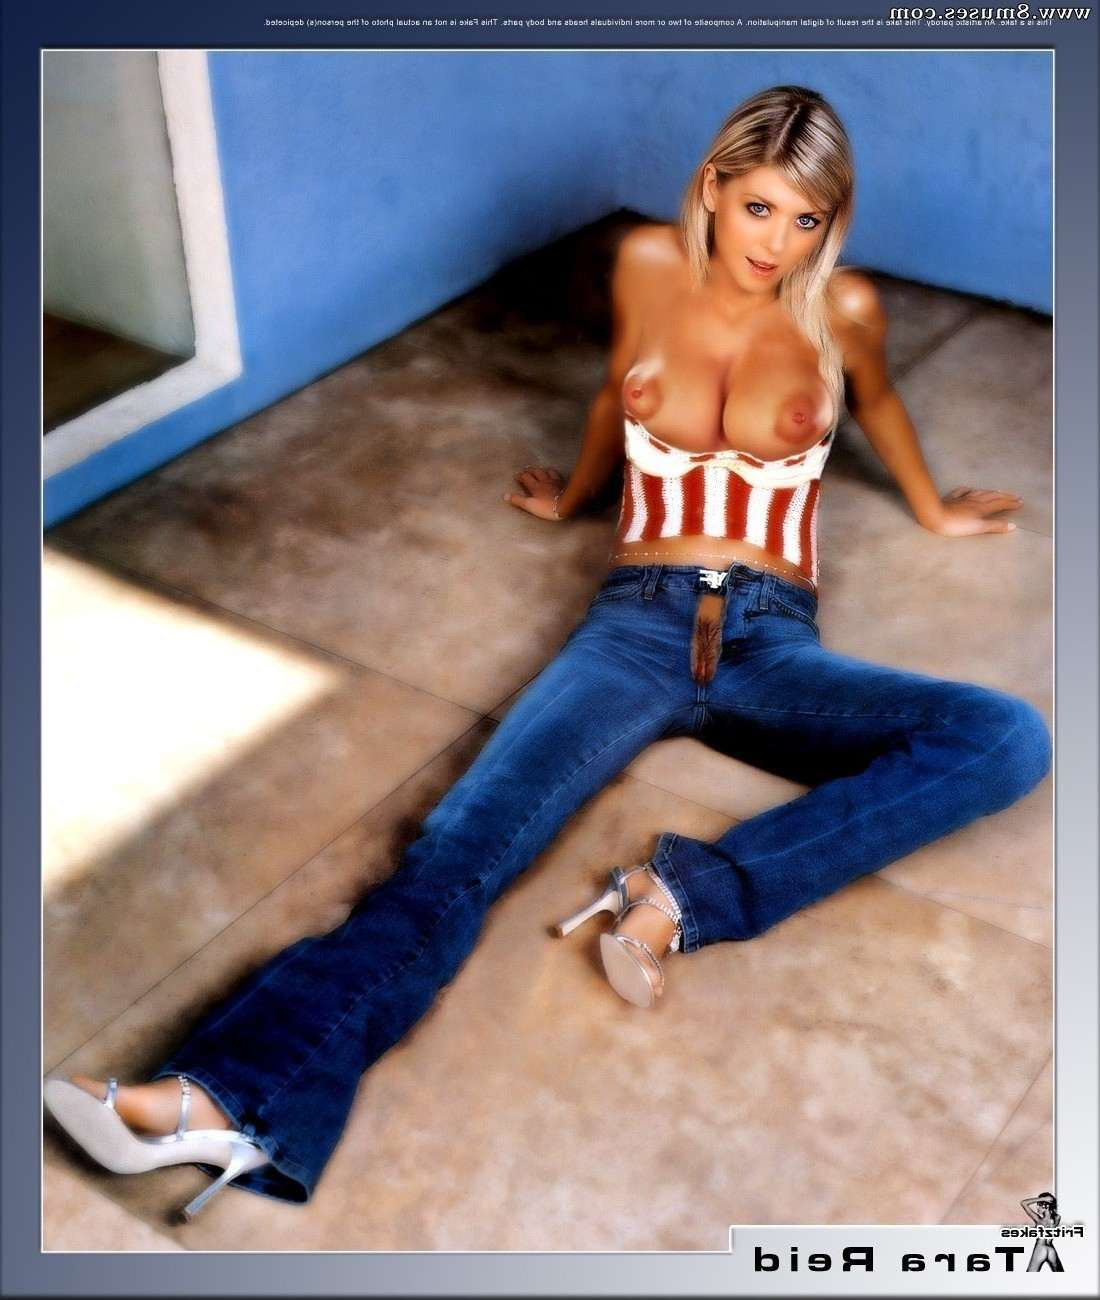 Fake-Celebrities-Sex-Pictures/Tara-Reid Tara_Reid__8muses_-_Sex_and_Porn_Comics_19.jpg